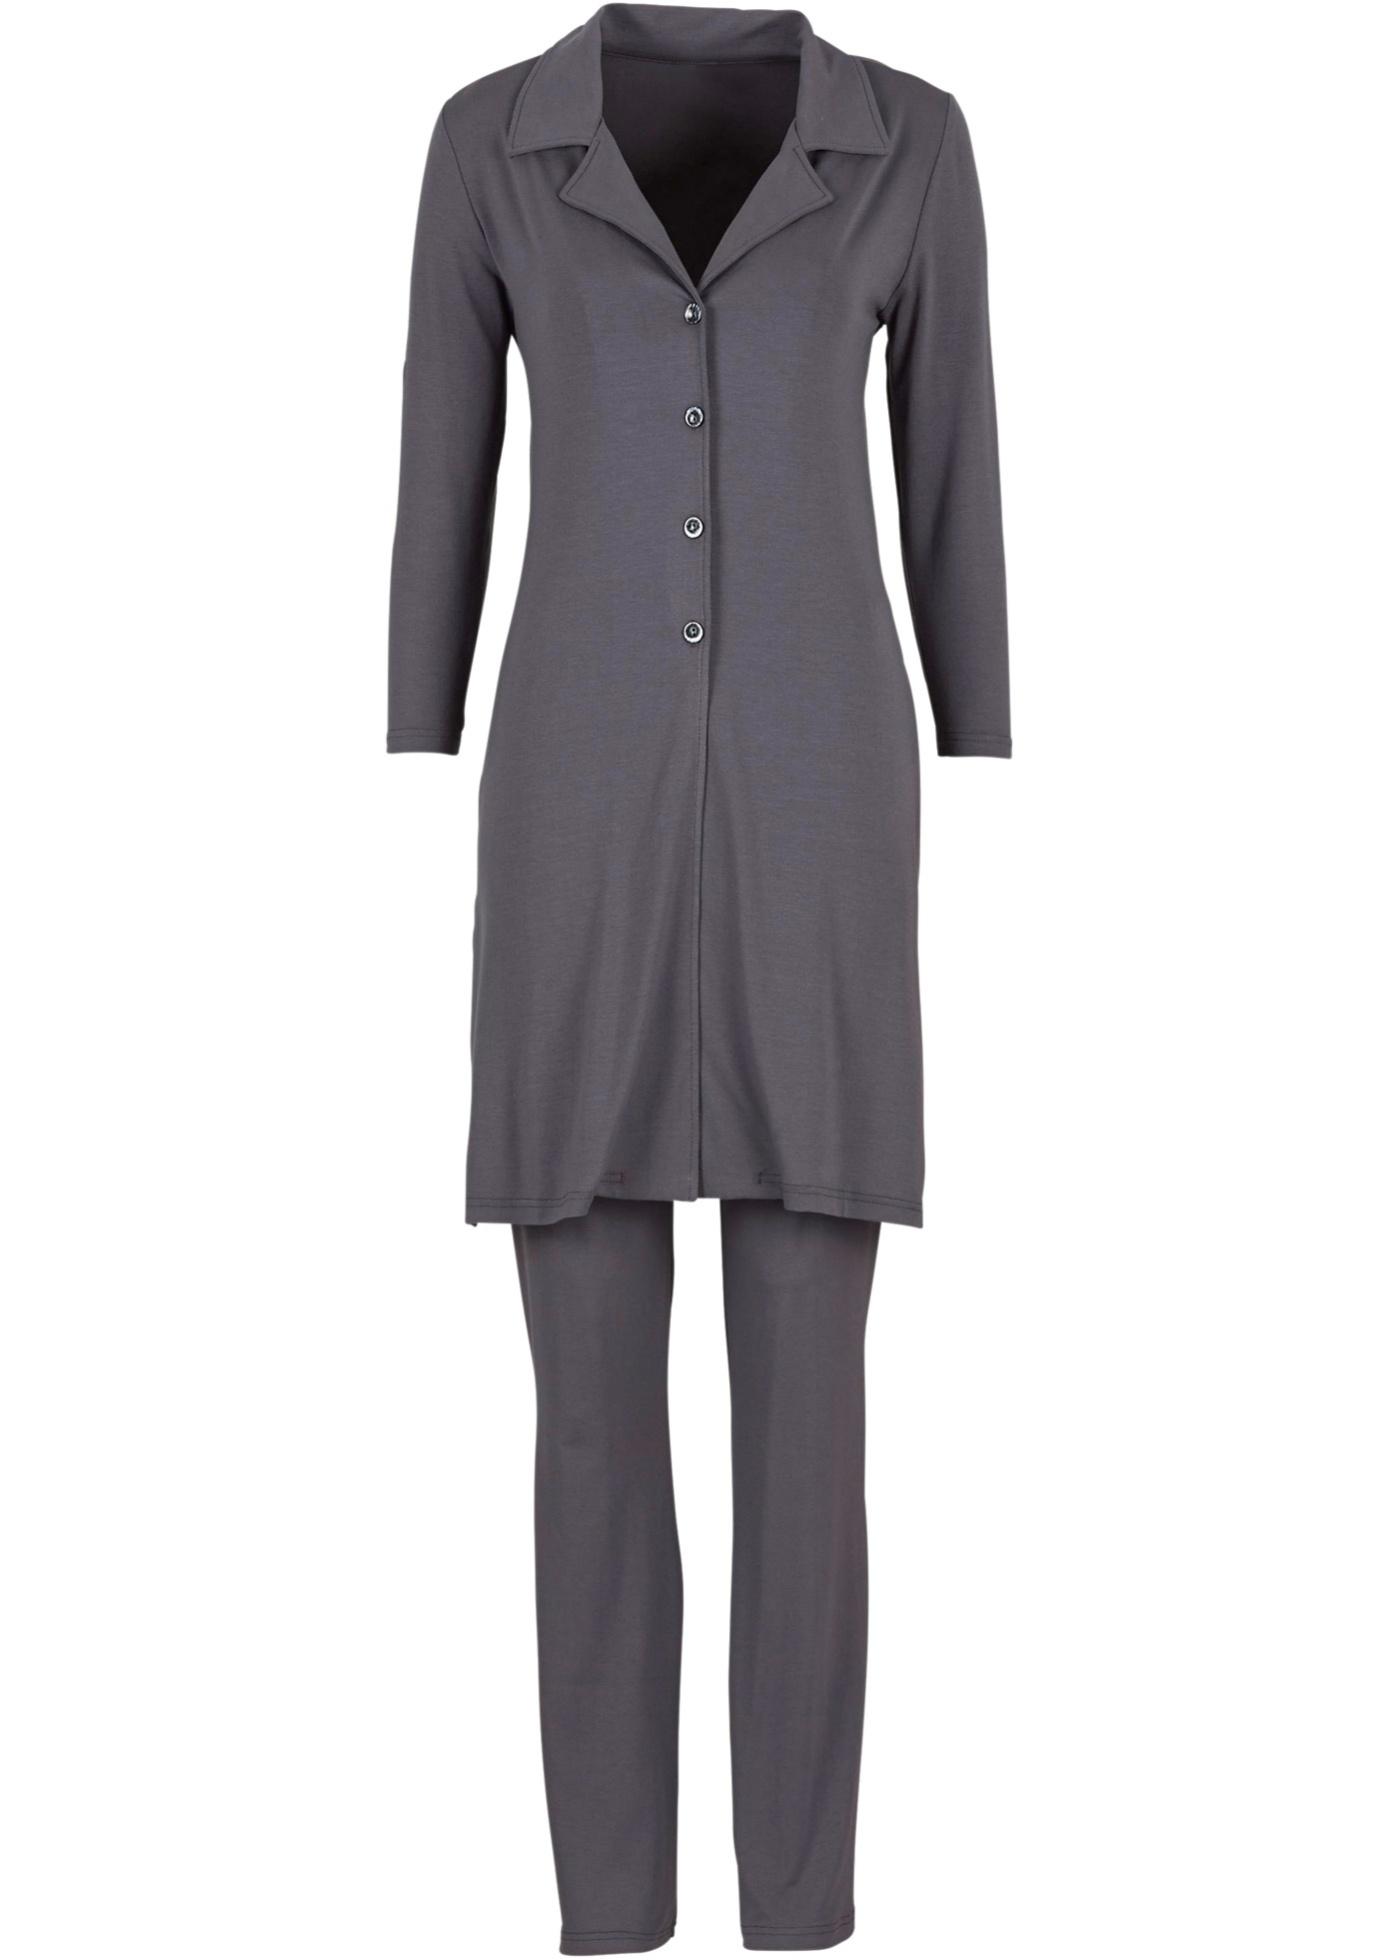 Conjunto blusa e calça cinza